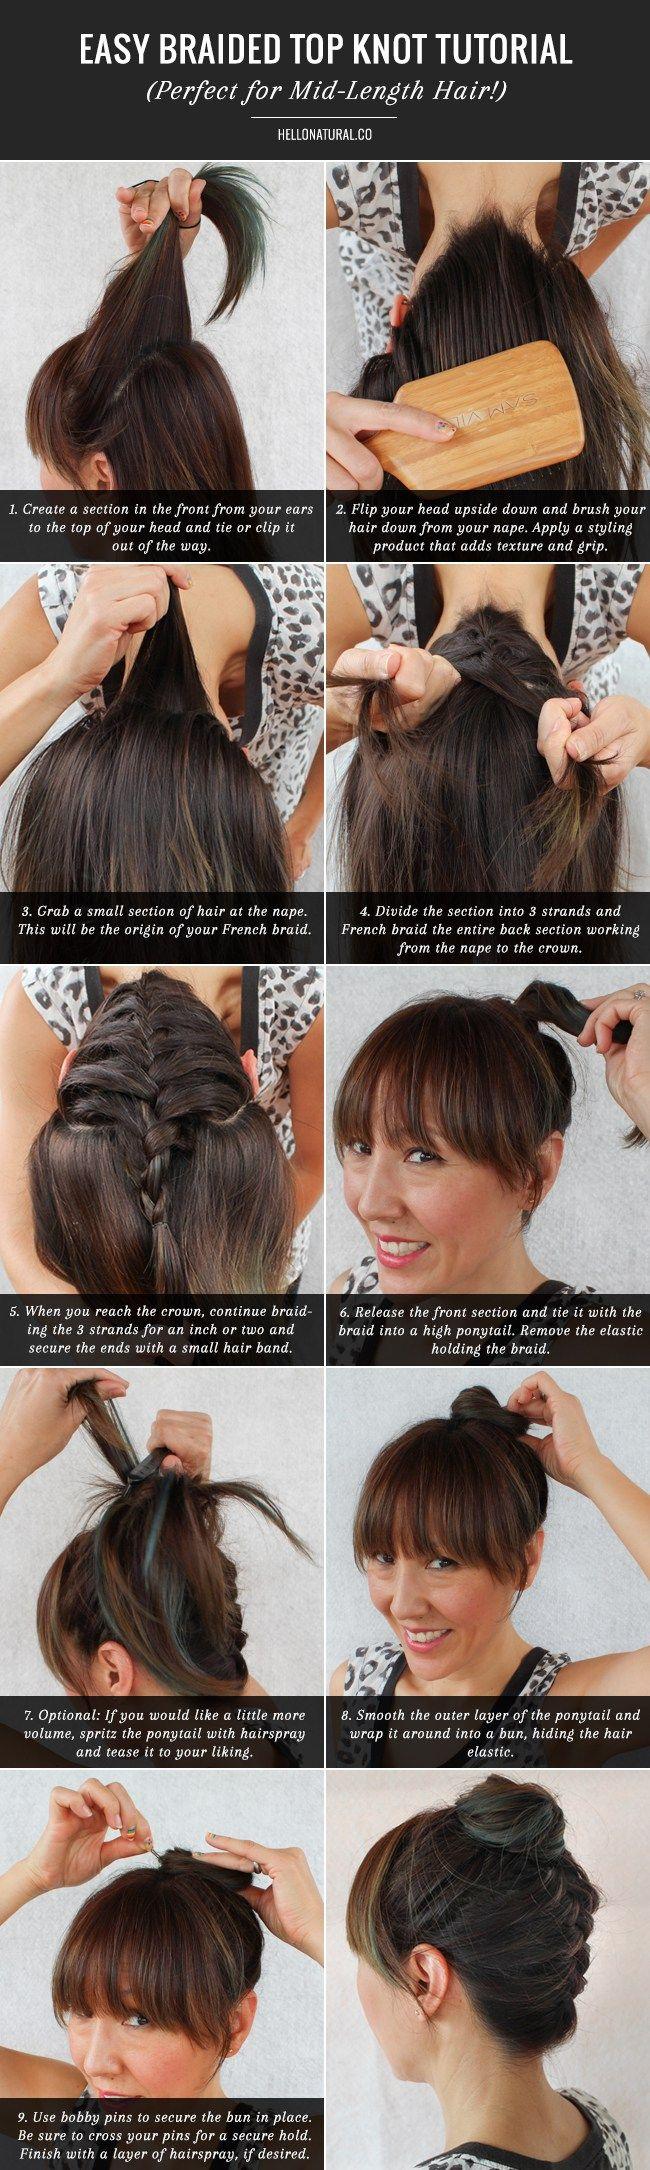 Best 25+ Braided Top Knots Ideas On Pinterest  Hair Knot Tutorial, Beach  Hair Tutorials And Short Braided Hairstyles